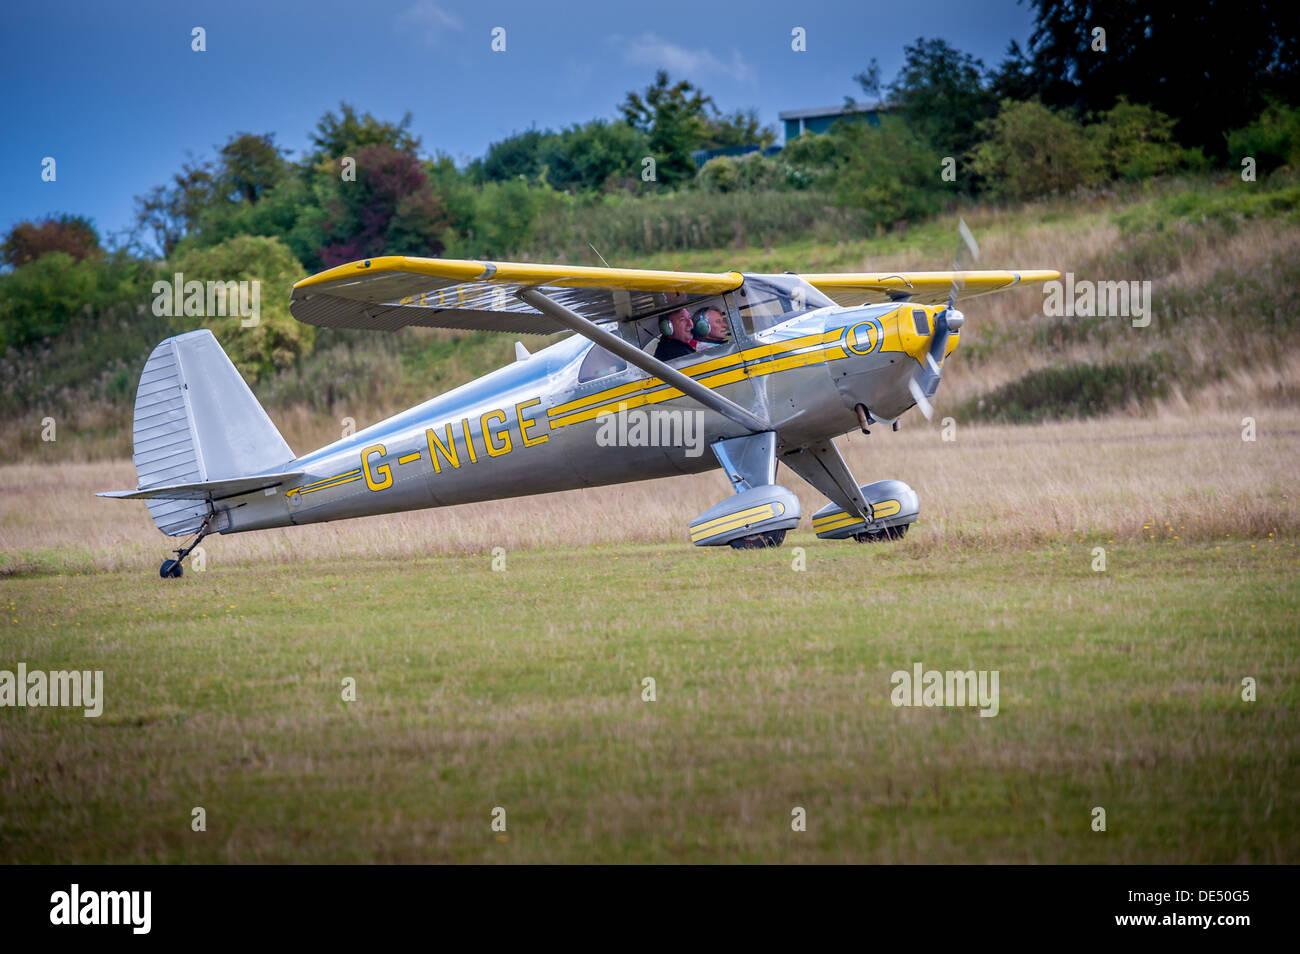 Luscombe vintage aeroplane - Stock Image